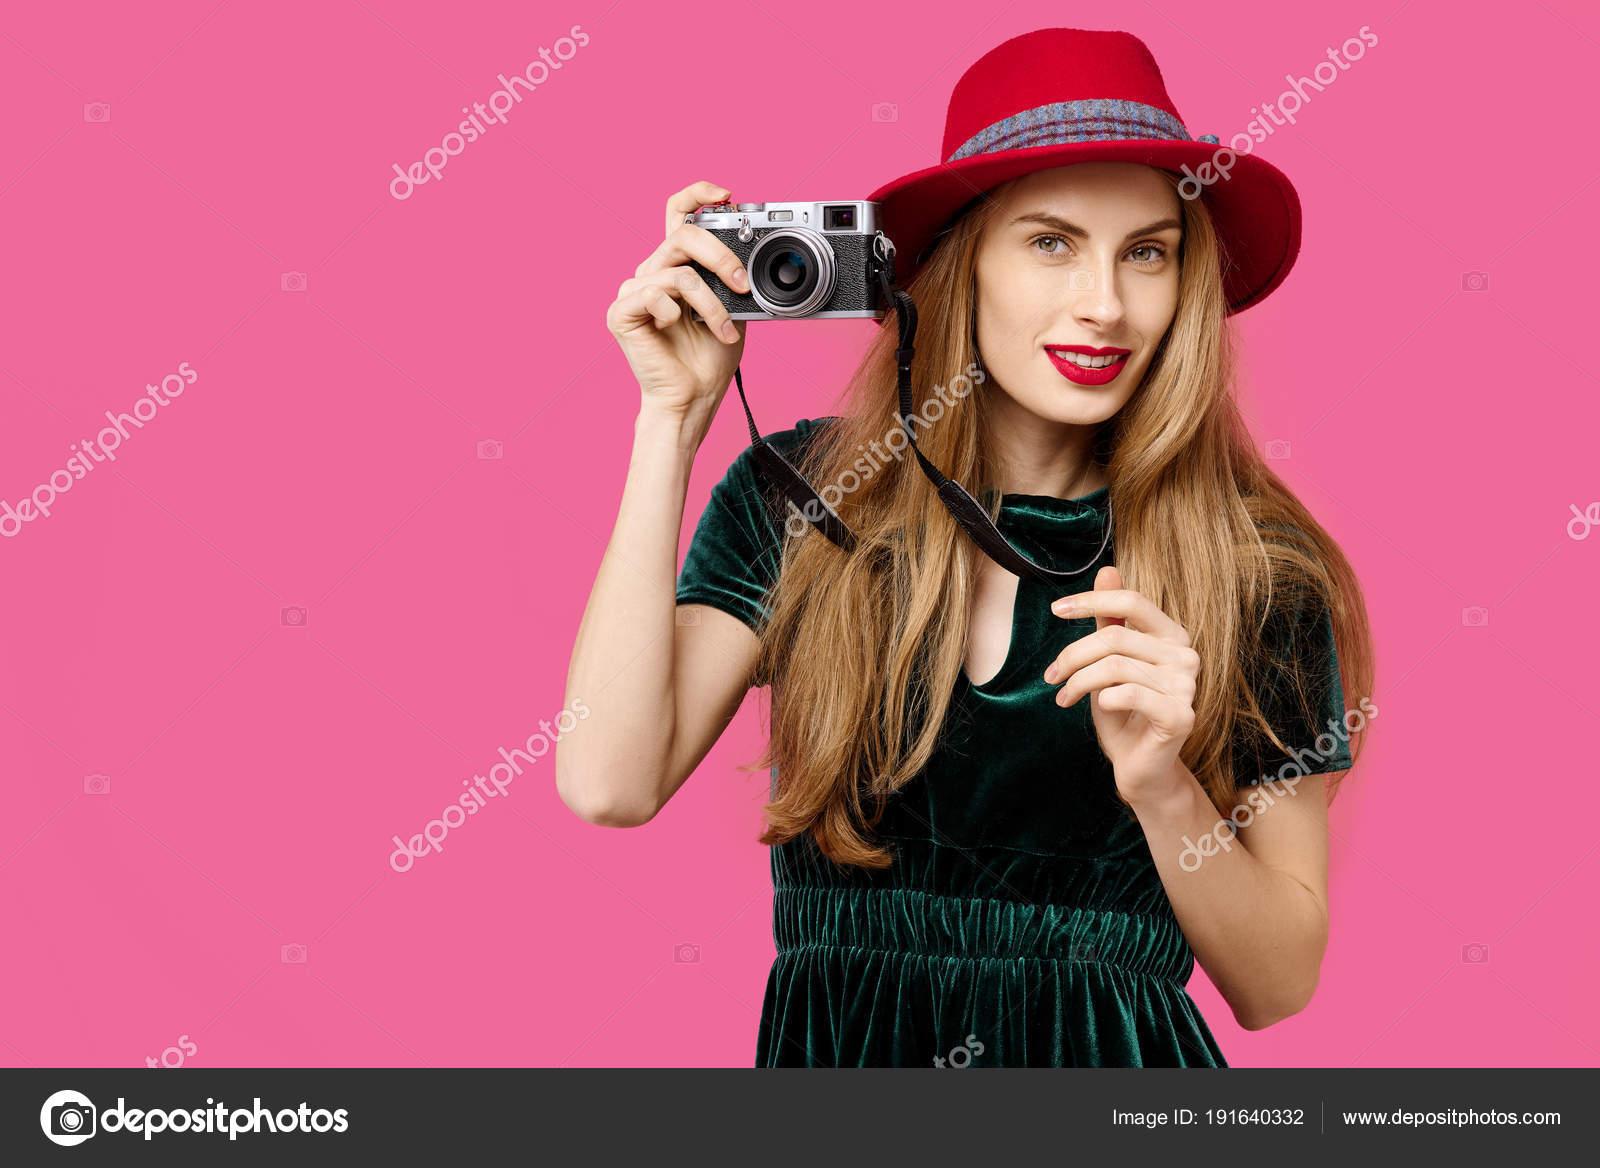 5642e87b160 Mladá krásná žena na růžovém pozadí v zelené šaty a klobouk drží rarita  kameru v ruce a úsměvem. Pojem zdravé výživy a sportu. Barevný koncept  posedlost.